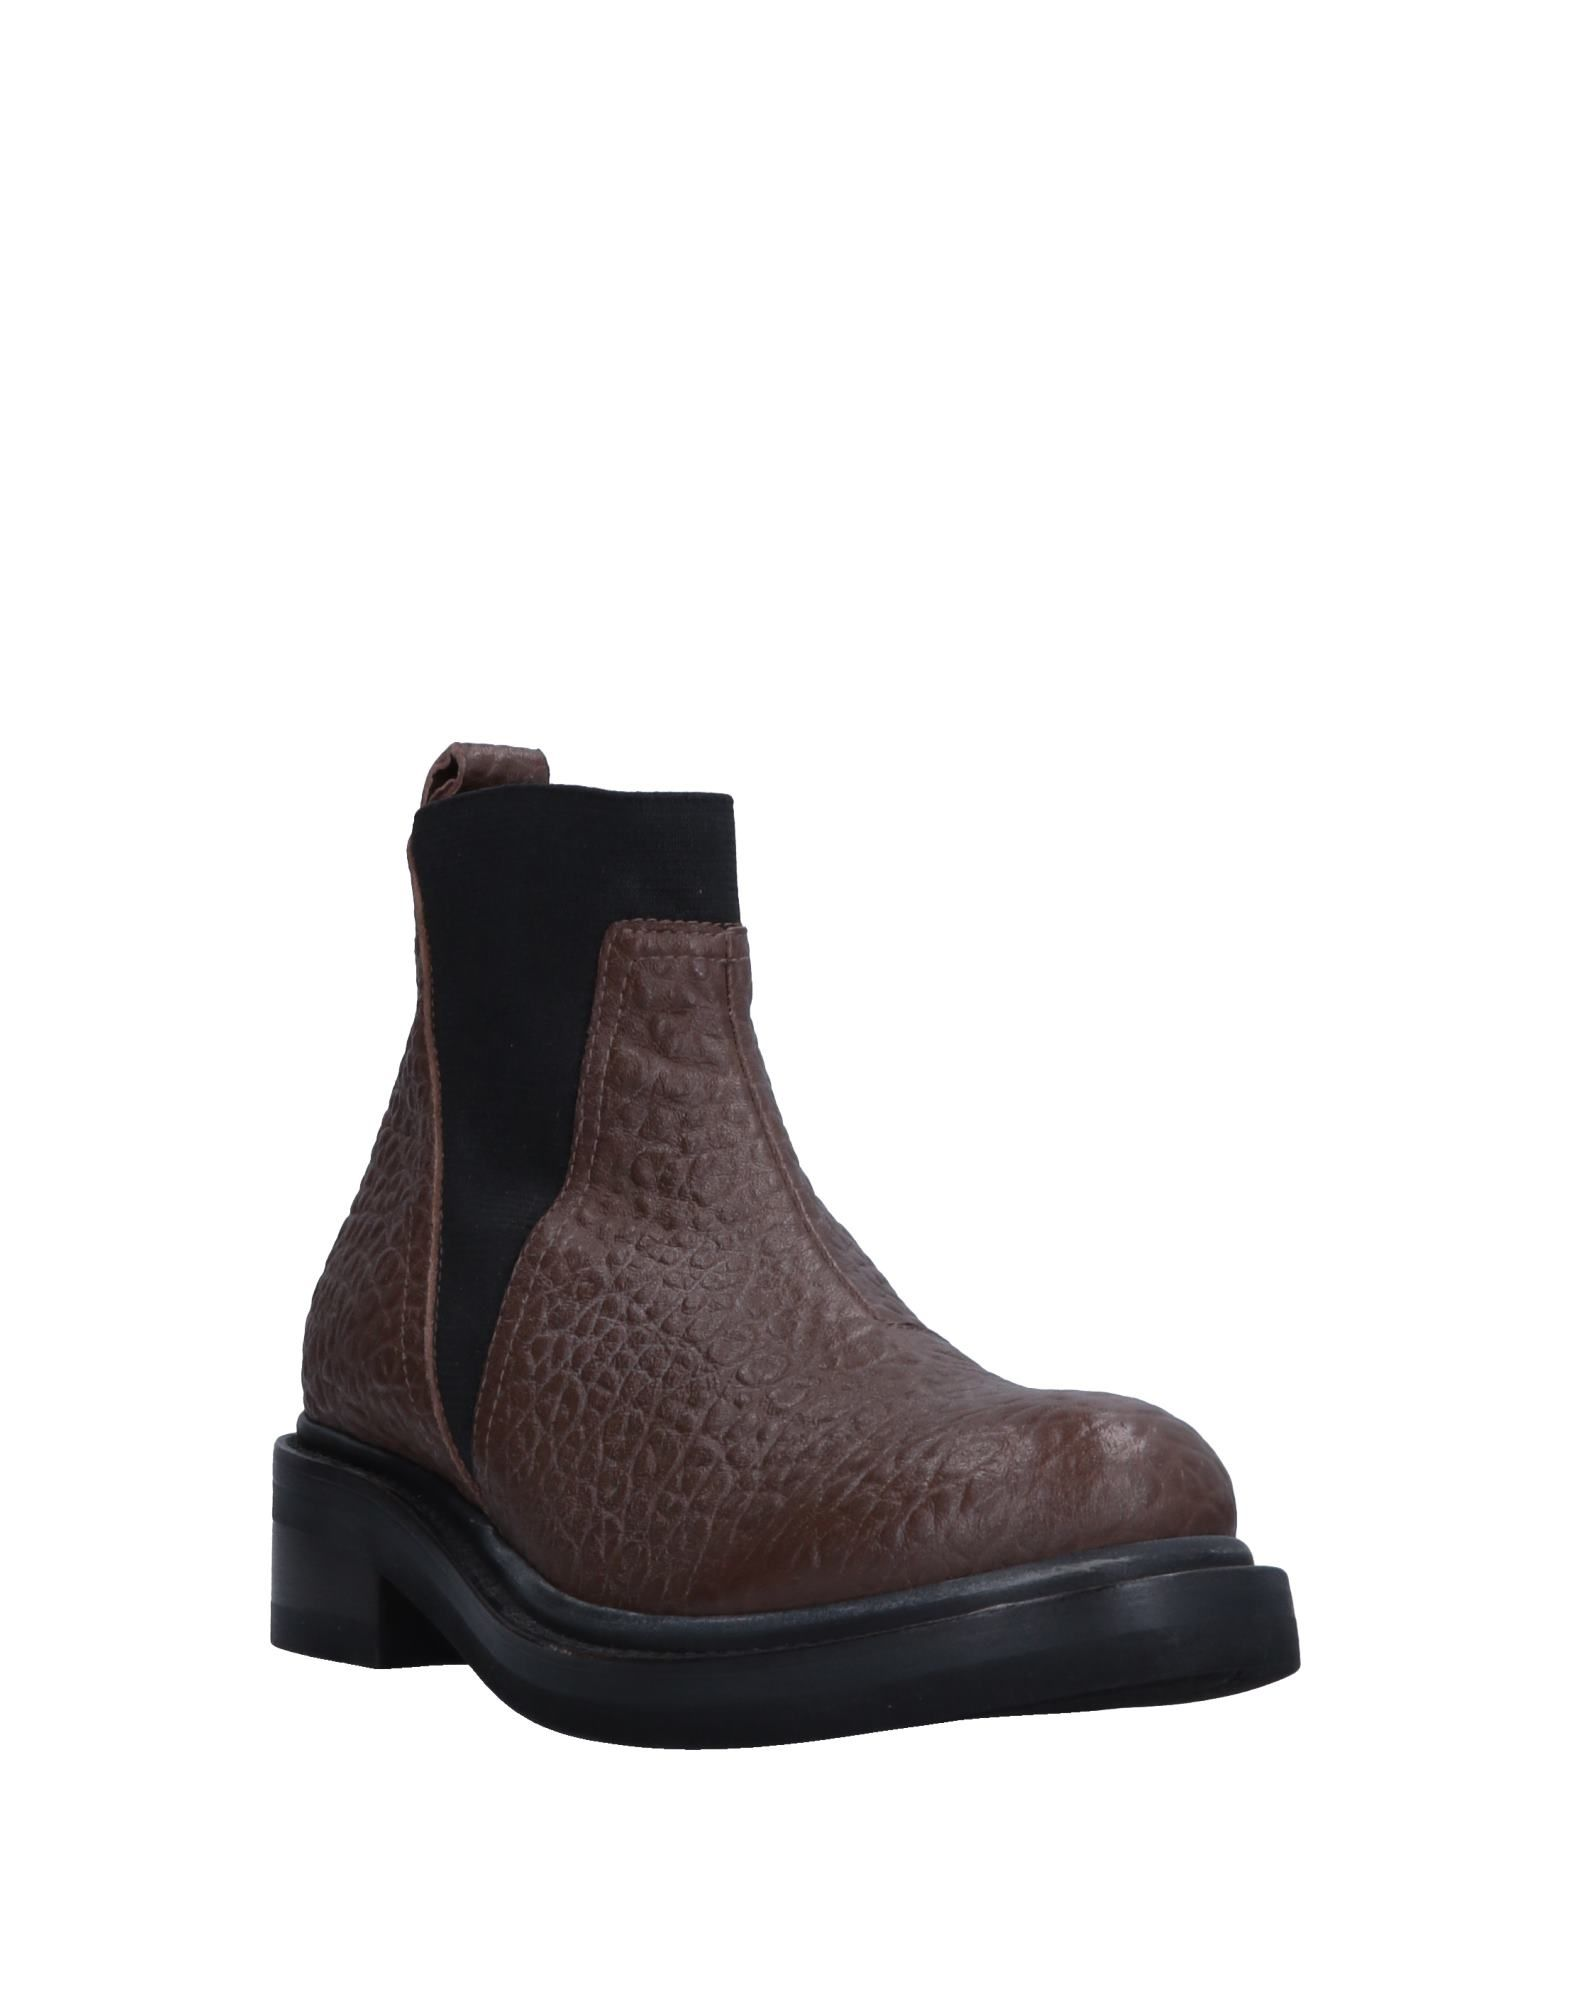 Buttero® Chelsea Boots aussehende Damen  11553096XOGut aussehende Boots strapazierfähige Schuhe f77c0b